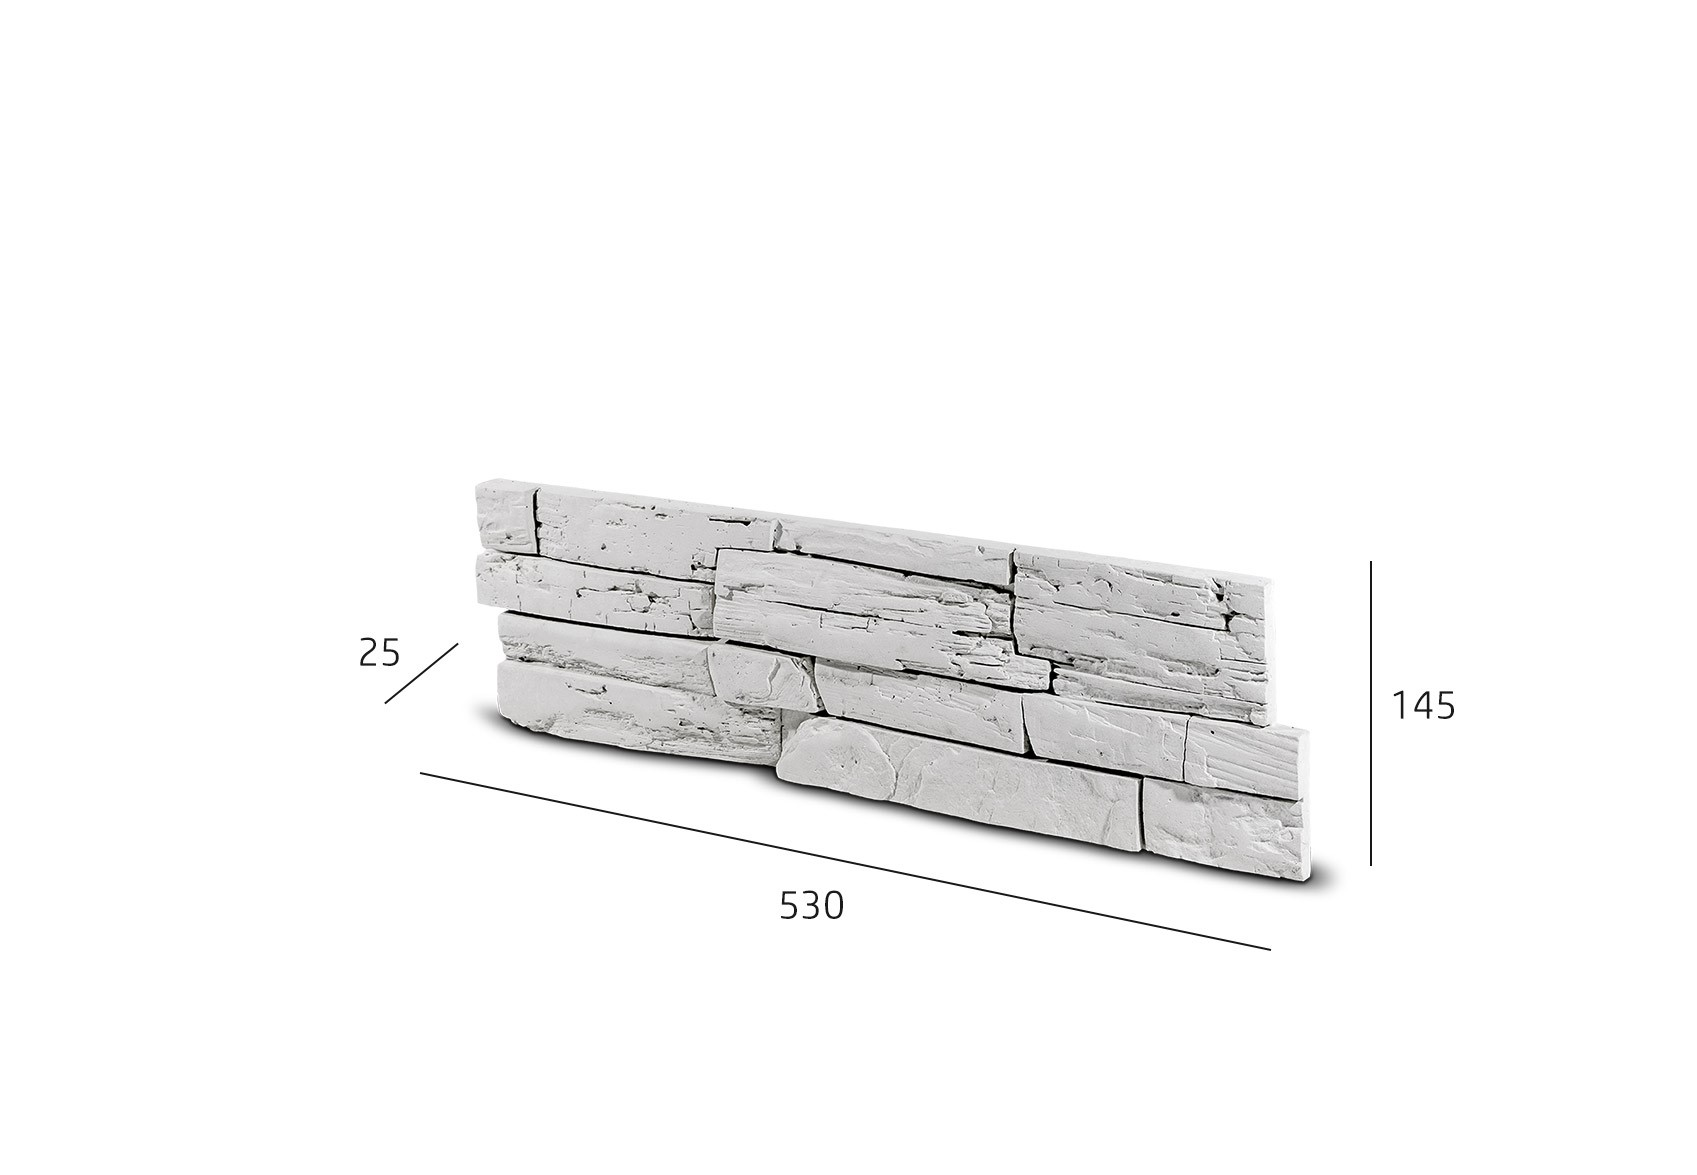 Kamenný obklad FASÁDA  bílý 530x145x25 mm Beton balení 0,46m2